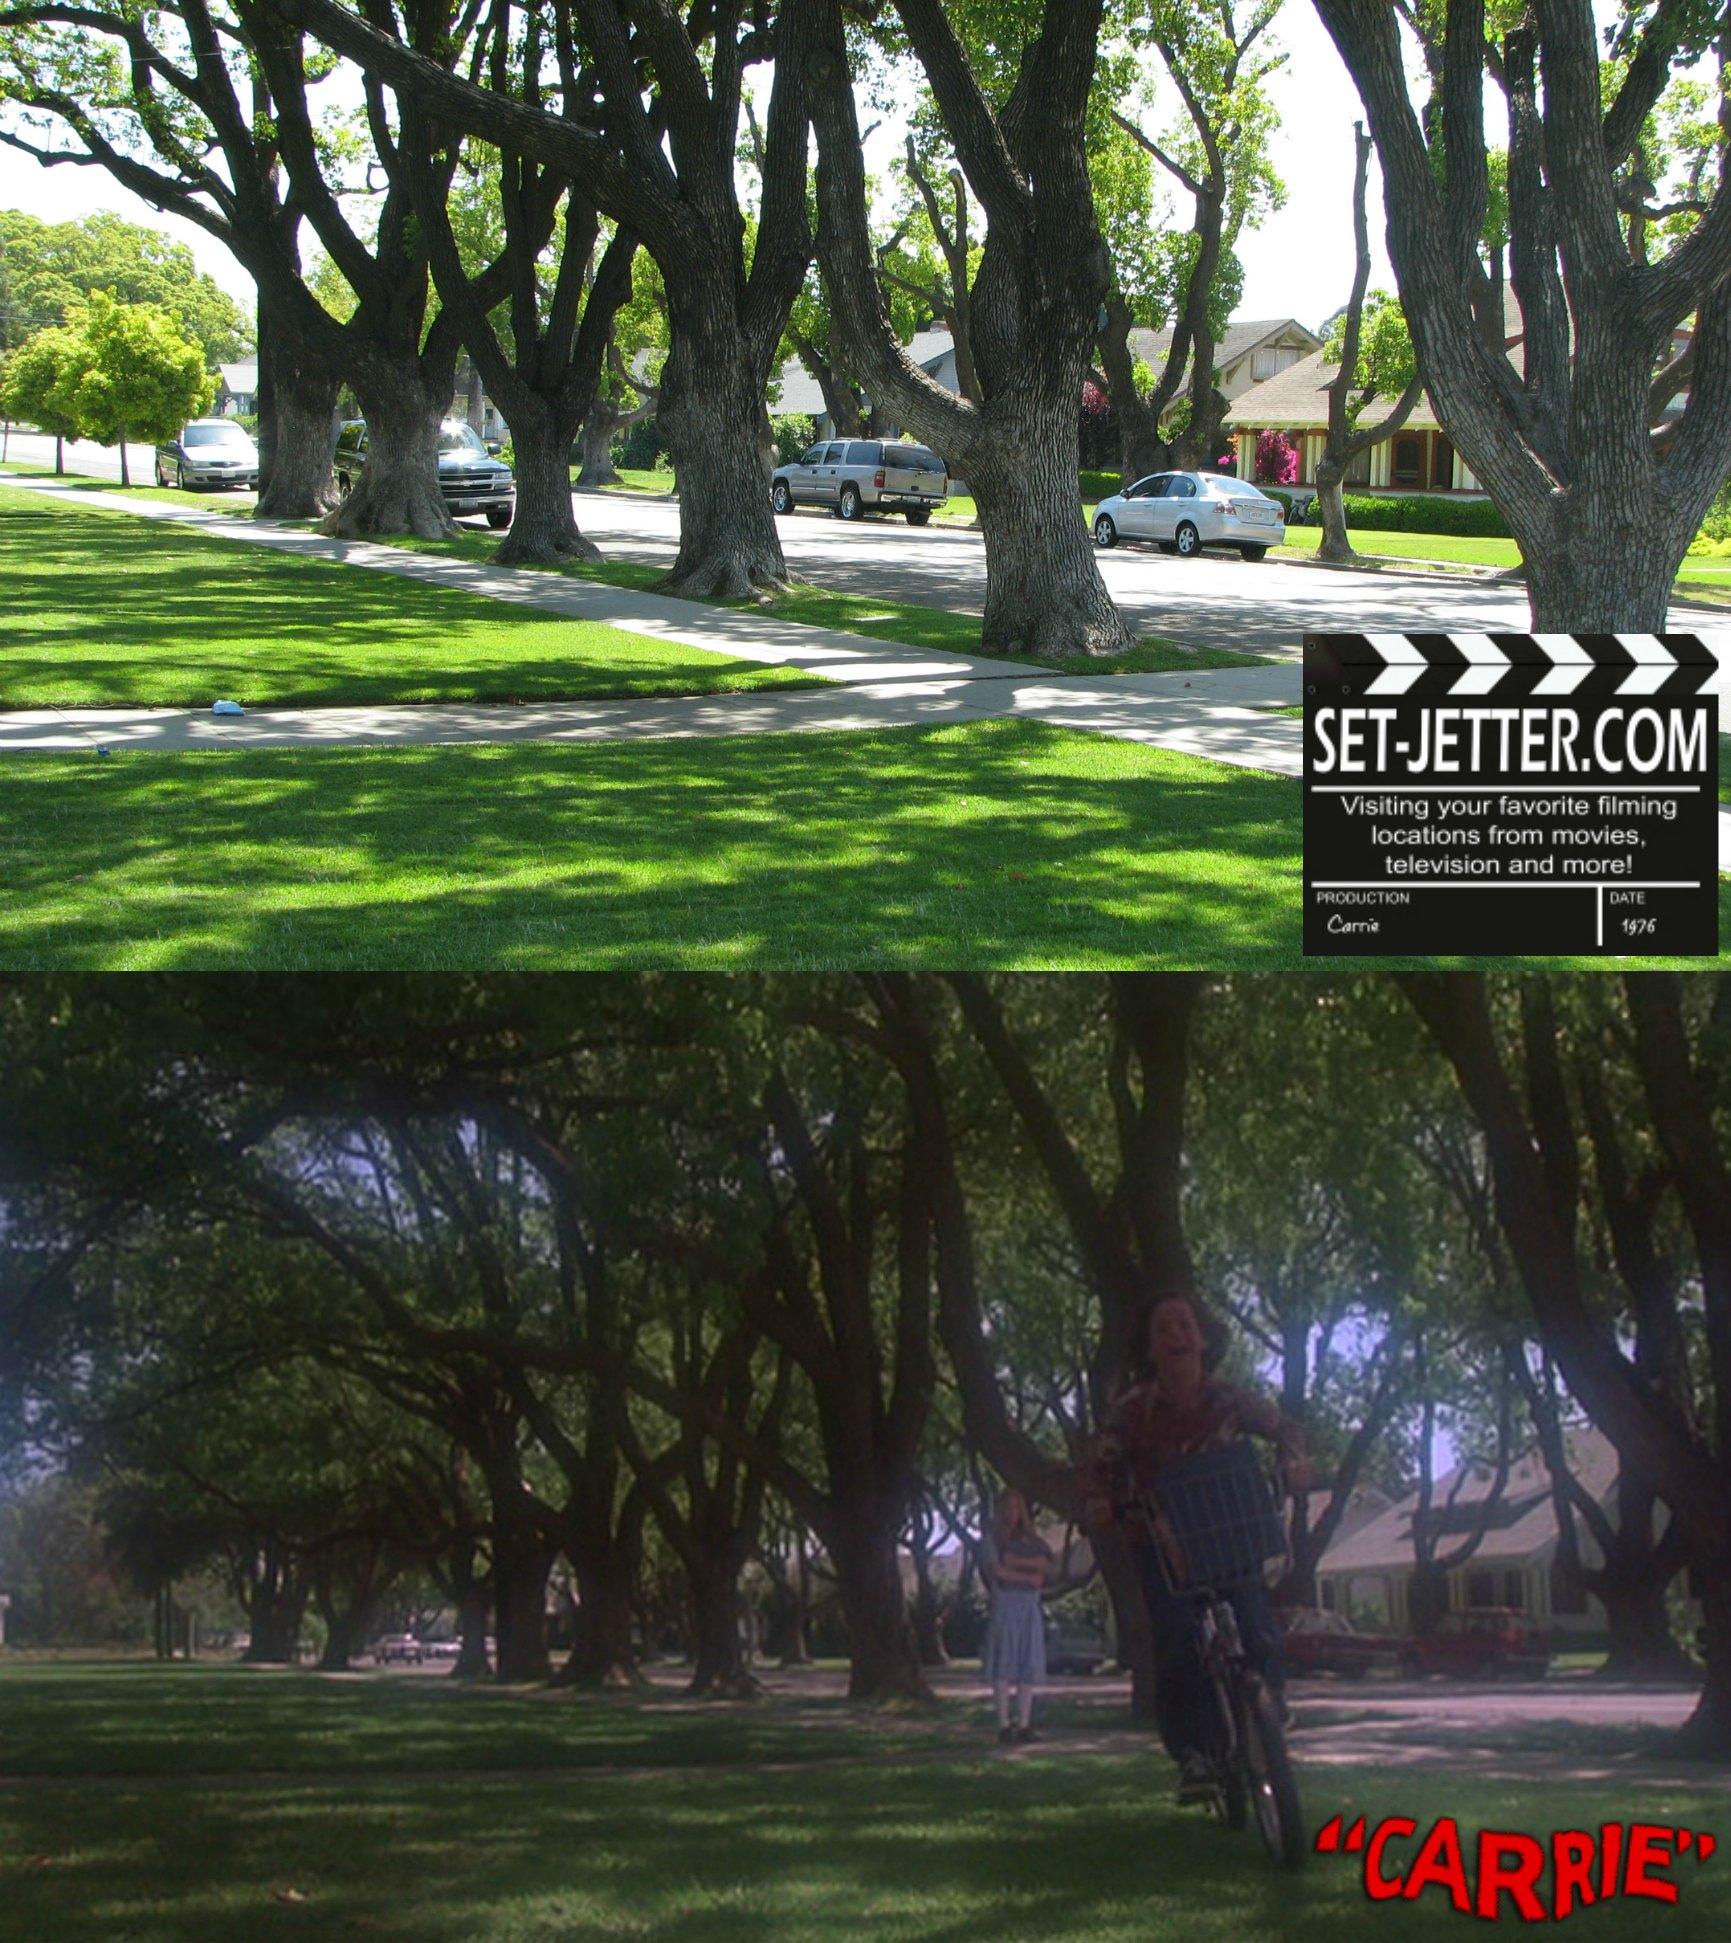 carrie trees 05.jpg